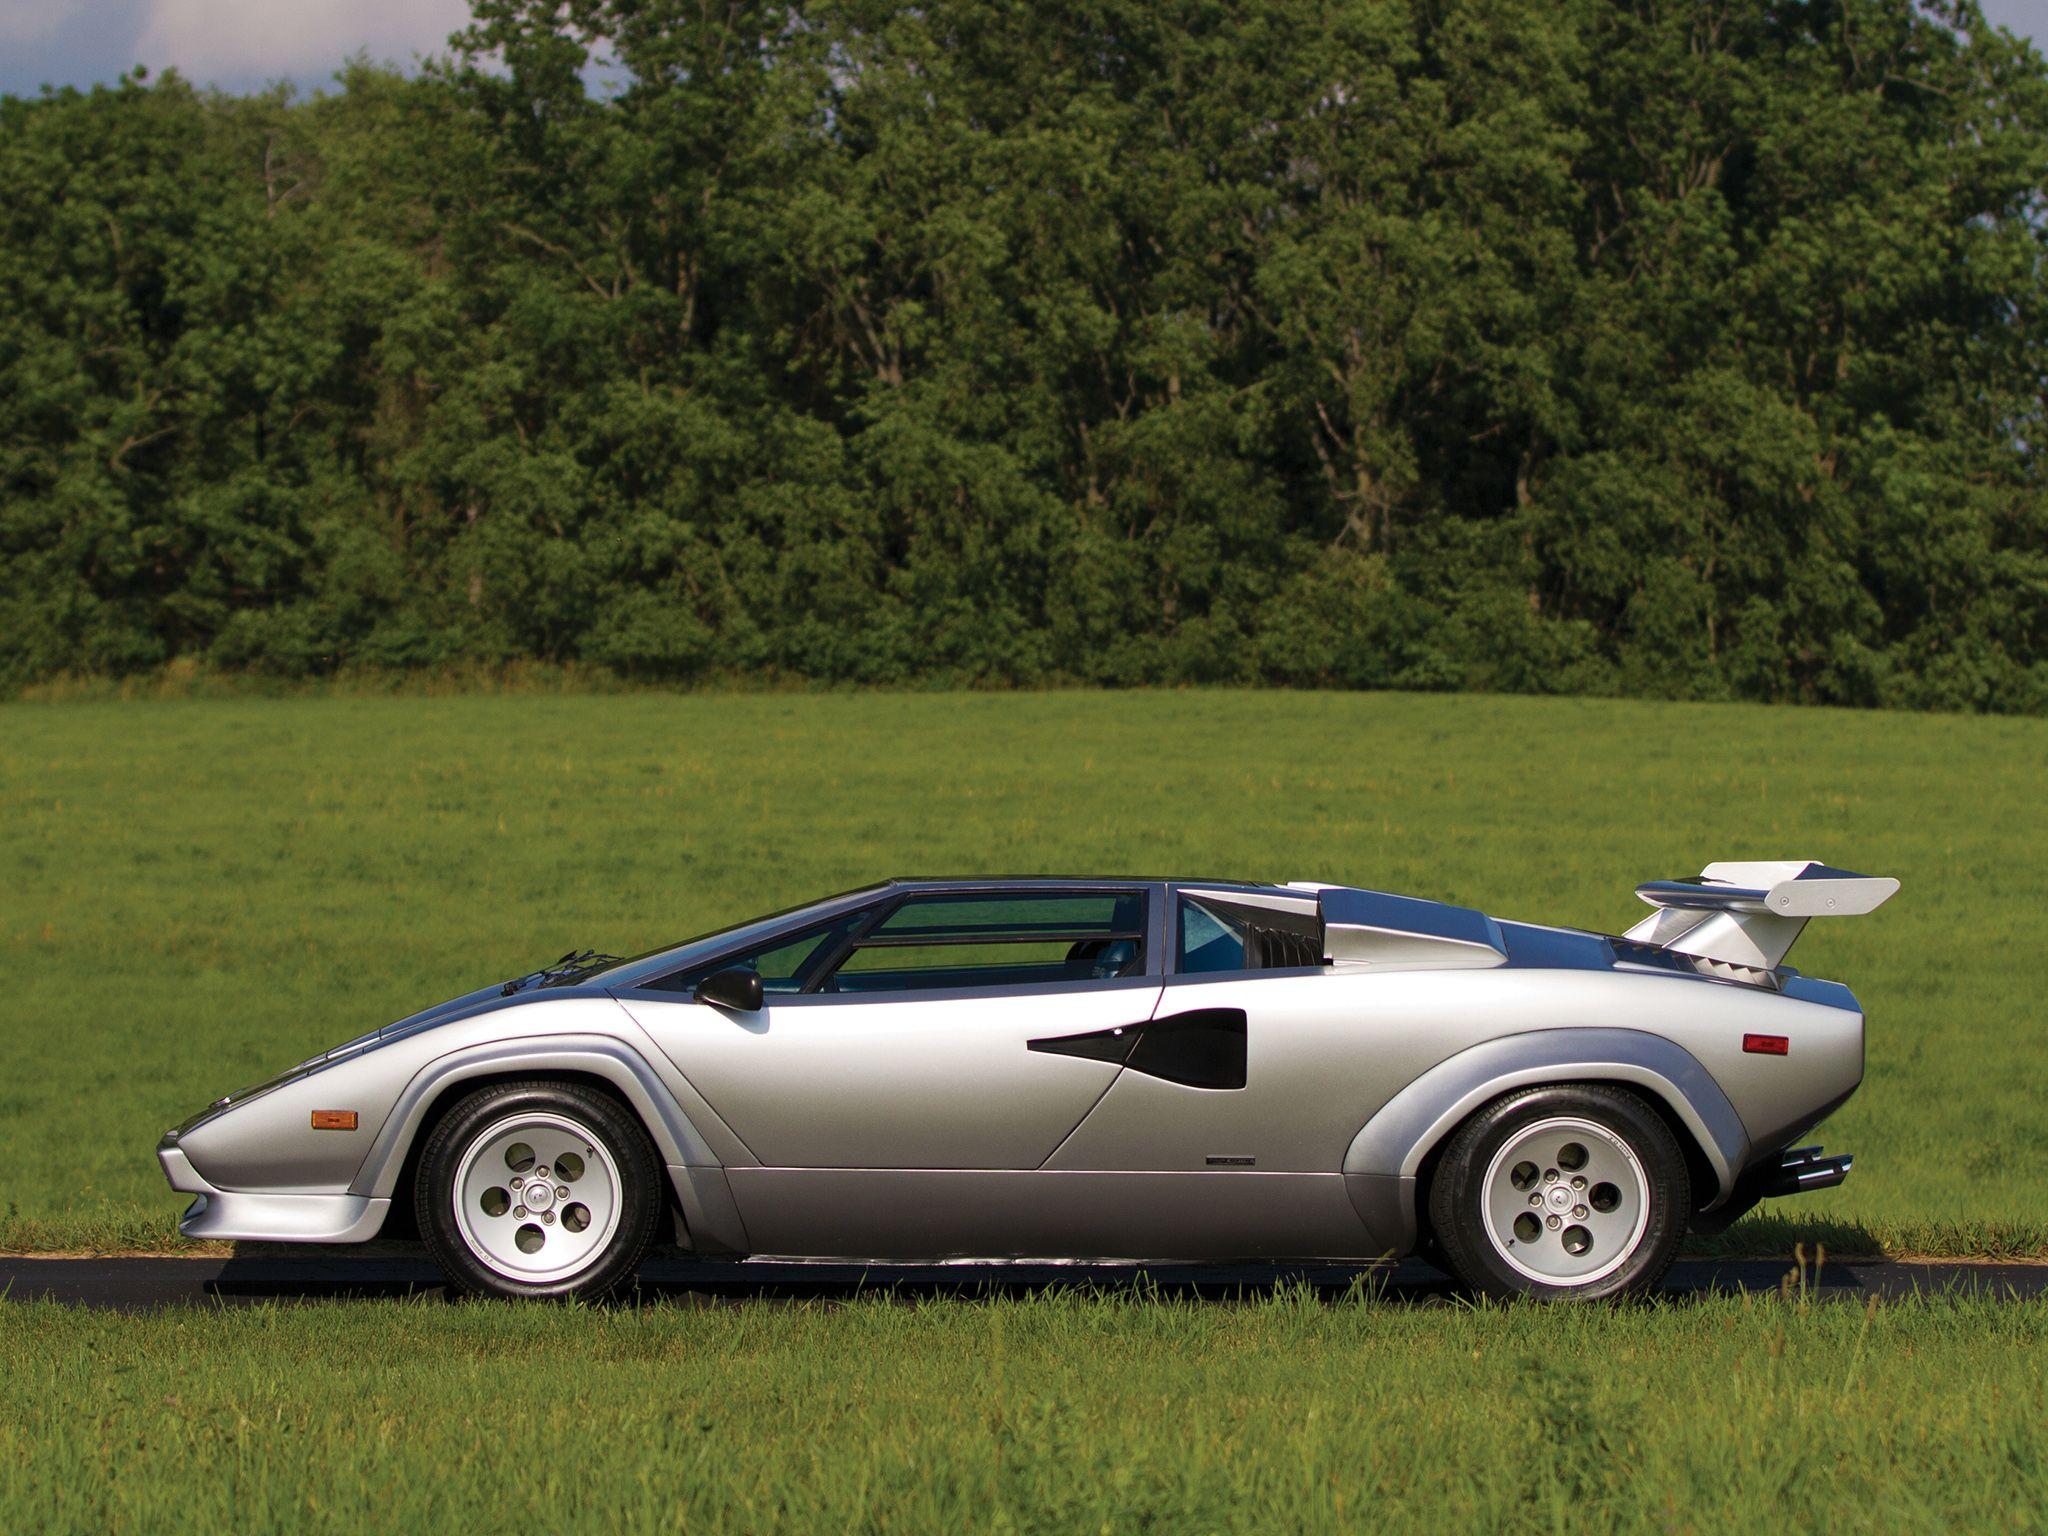 7dcc00dffe57a05a7a42b14e812228a8 Elegant Lamborghini Countach 25th Anniversary Specs Cars Trend